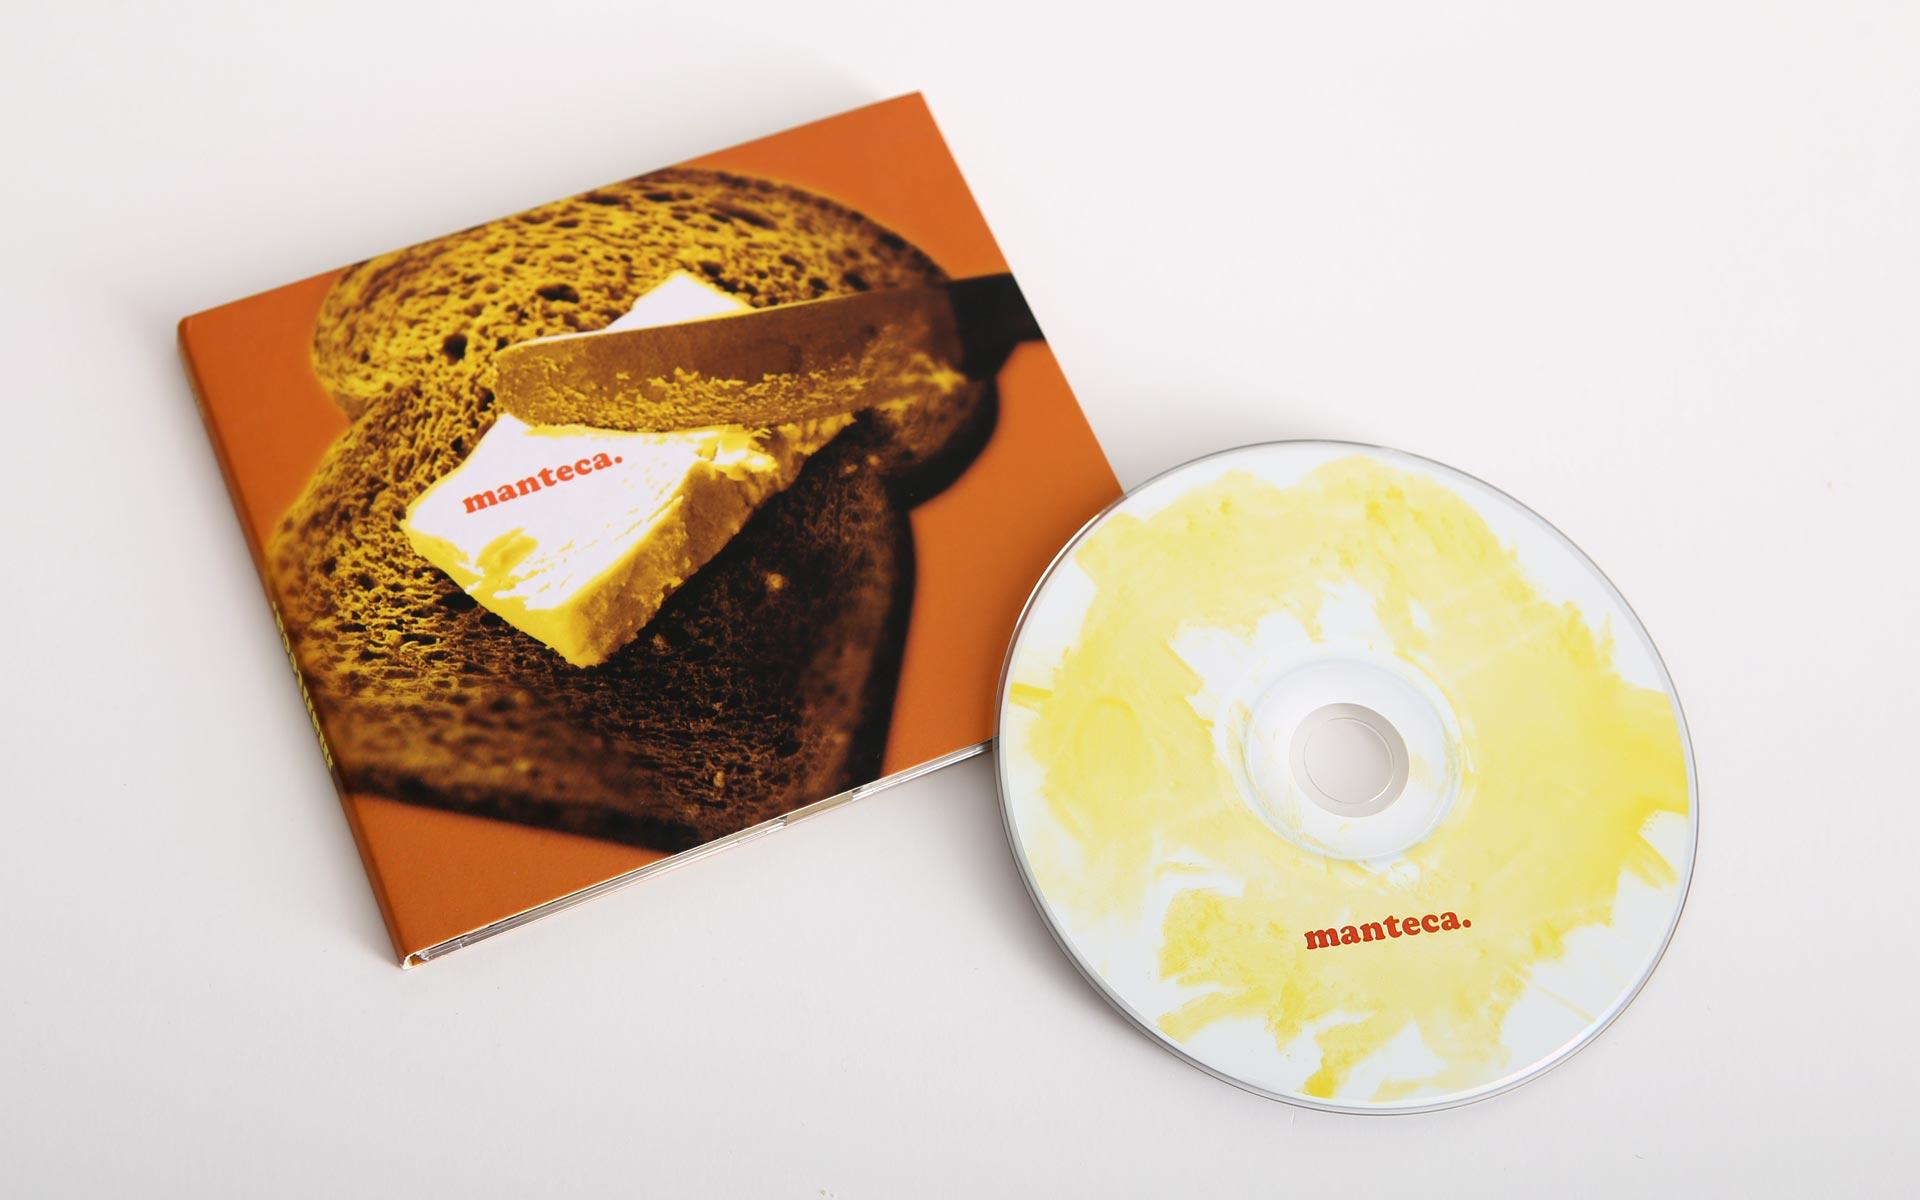 Manteca: CD cover design for Australian guitar ensemble